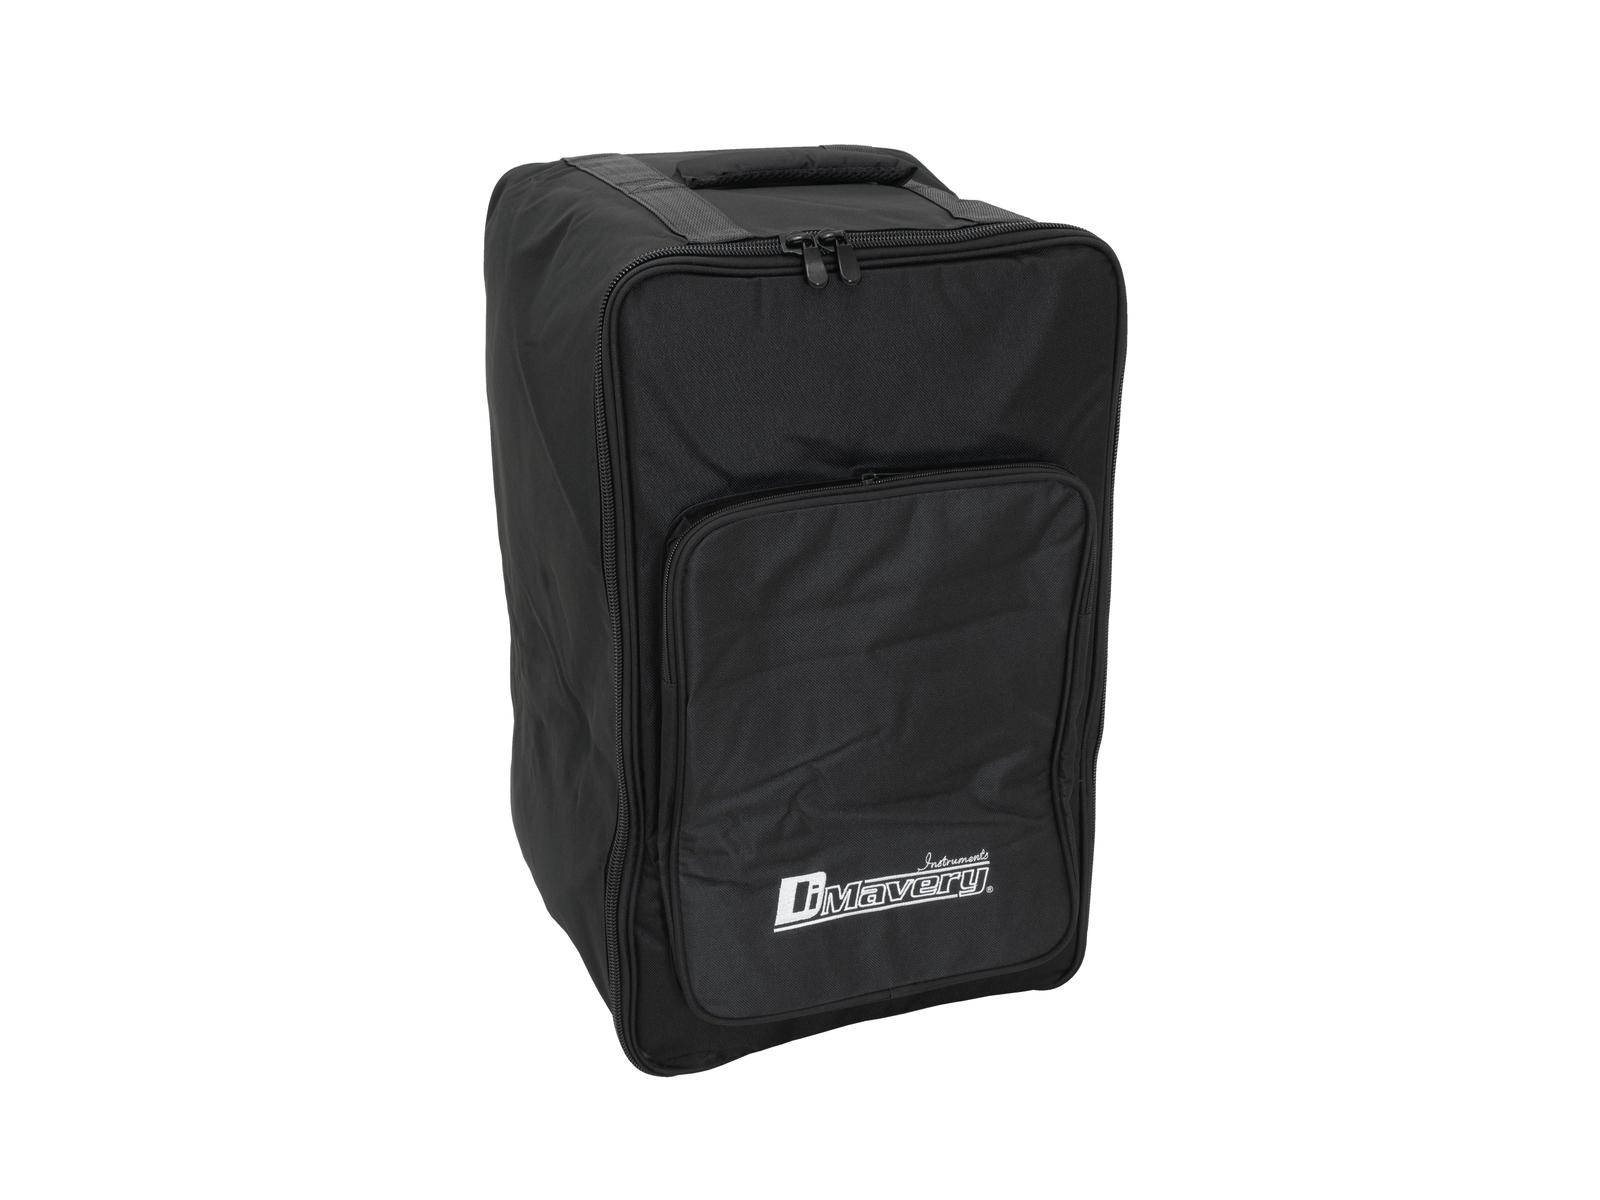 DIMAVERY CJT-01 Nylon-Tasche für Cajon